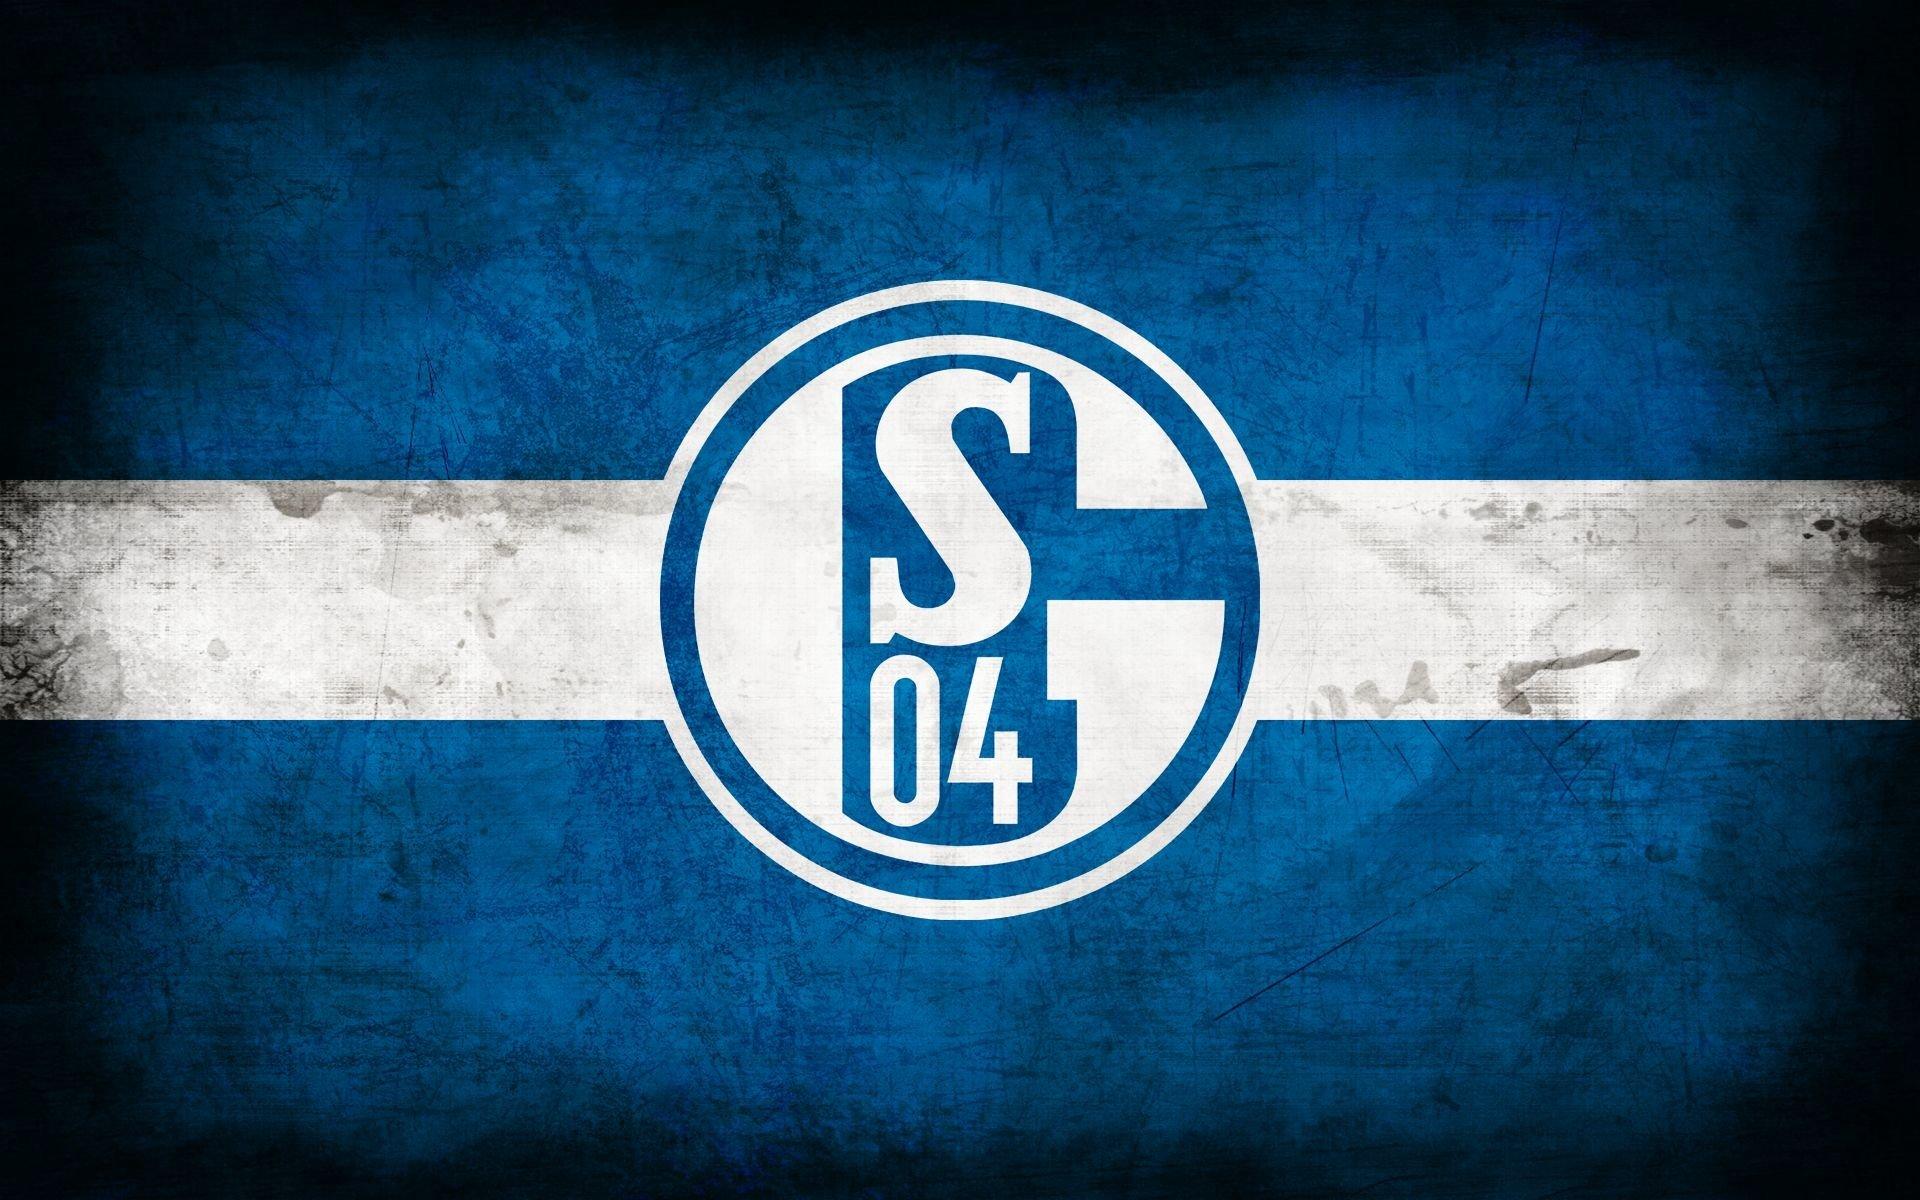 Fc Schalke 04 Hd Wallpaper Hintergrund 1920x1200 Id 1024839 Wallpaper Abyss